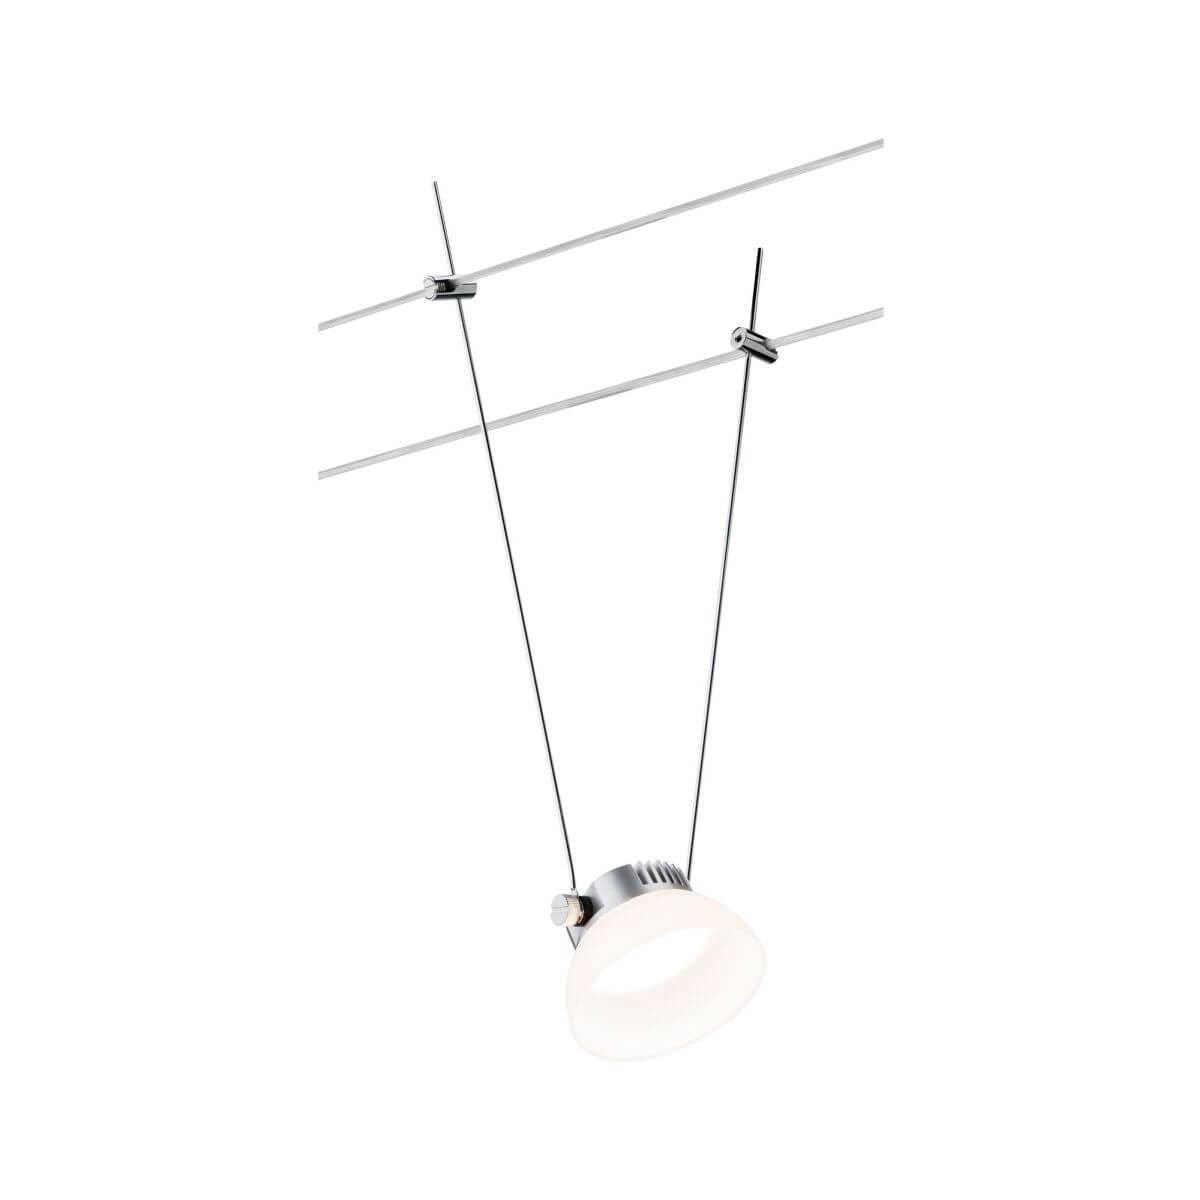 Paulmann Seilspot IceLED I,  4W, 12 V DC, Warmweiß,  Chrom matt | Weiß